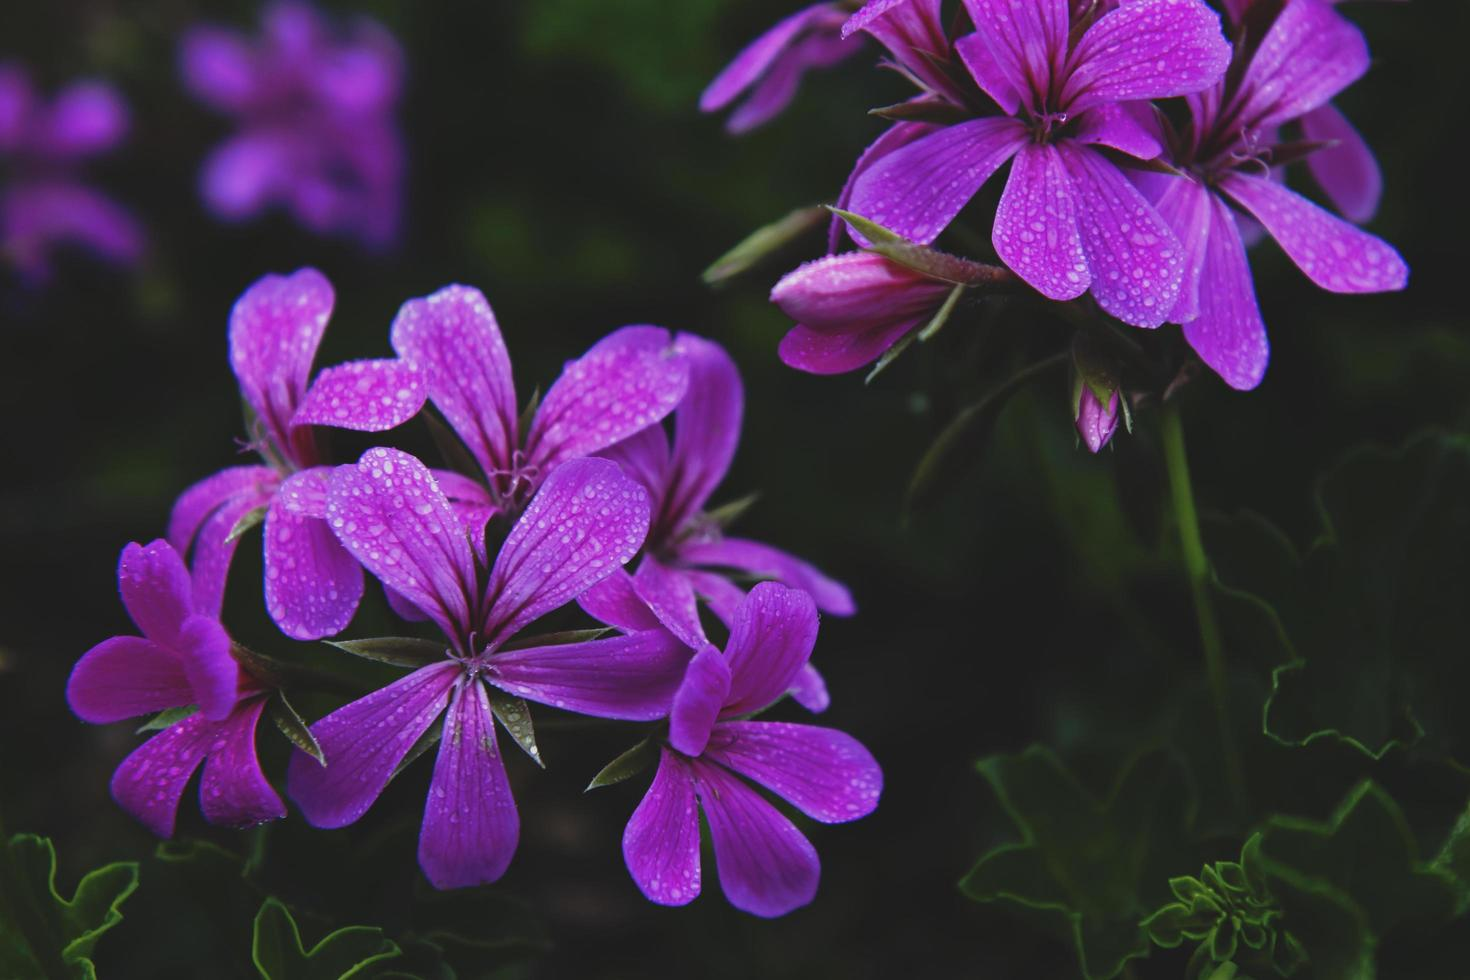 Close-up of purple petaled flowers photo